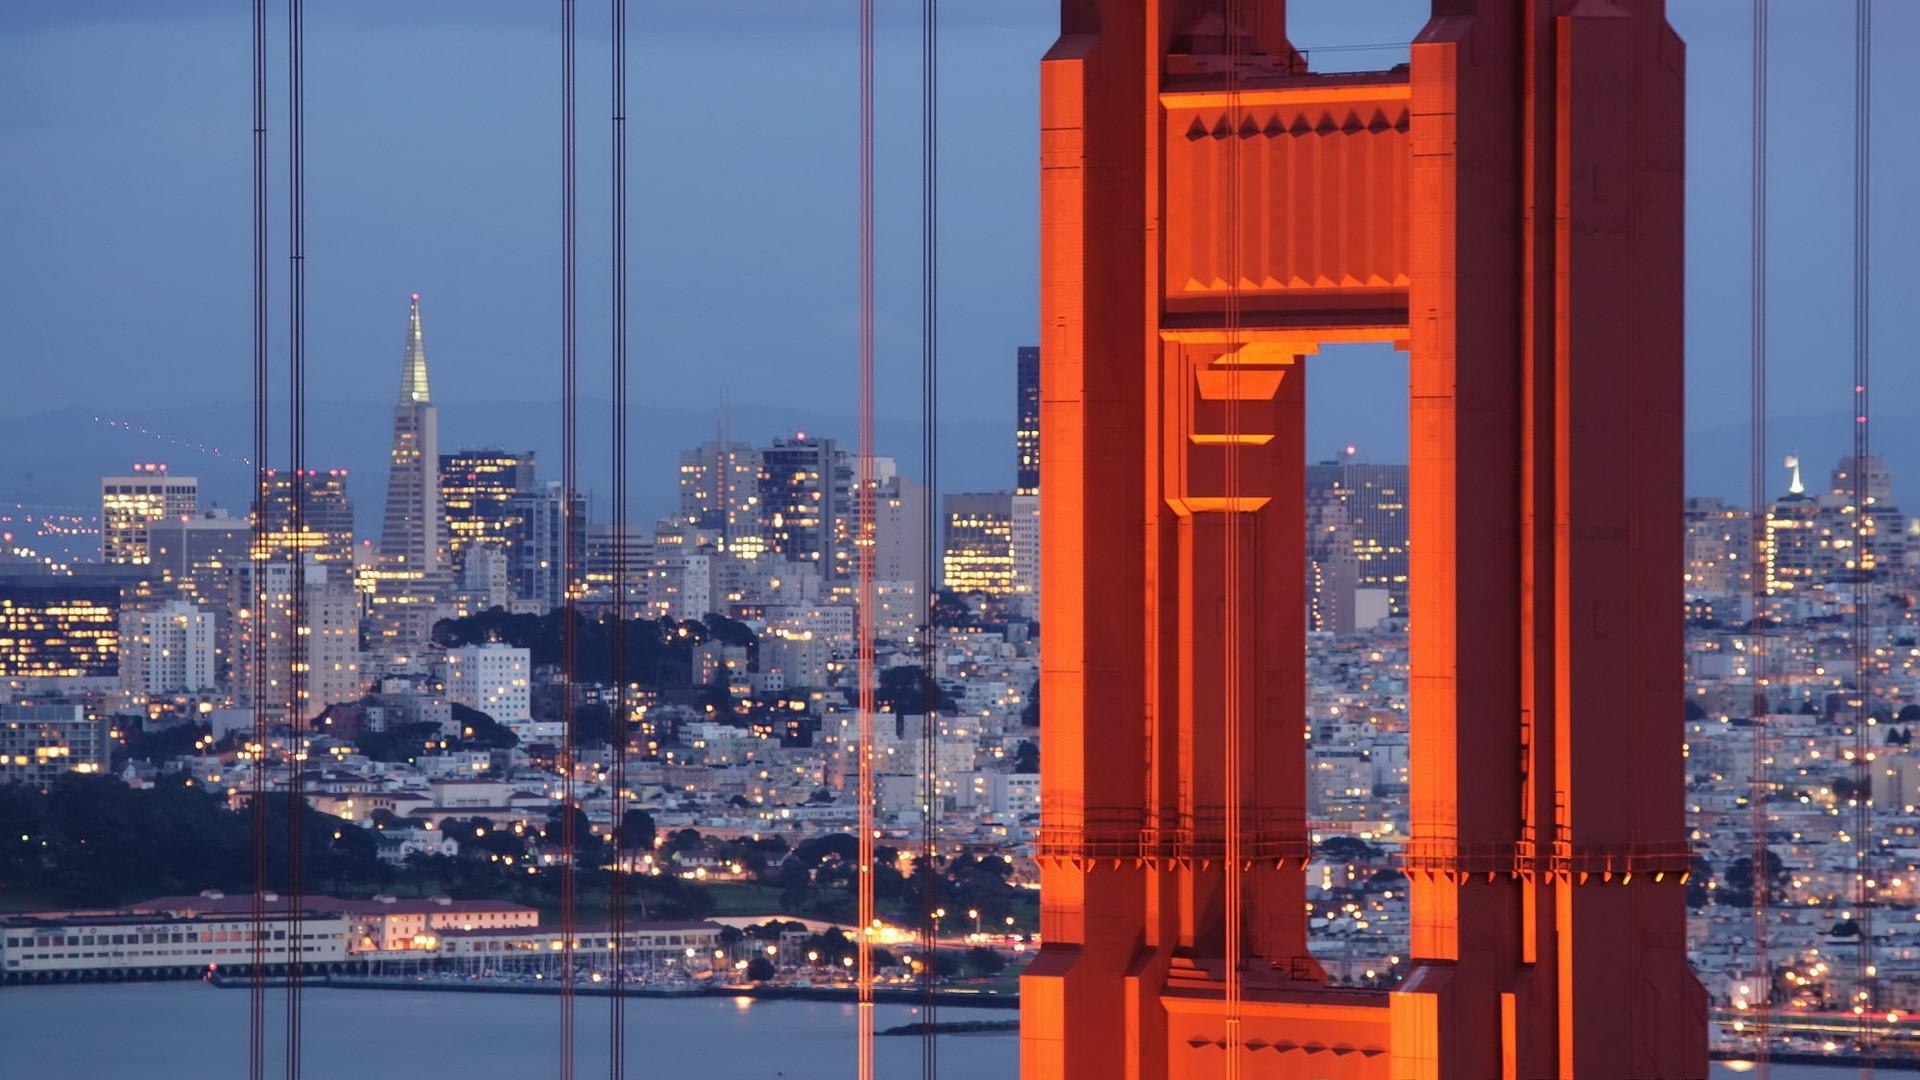 Golden Gate Bridge California San Francisco Wallpaper 1920x1080 198422 Wallpaperup